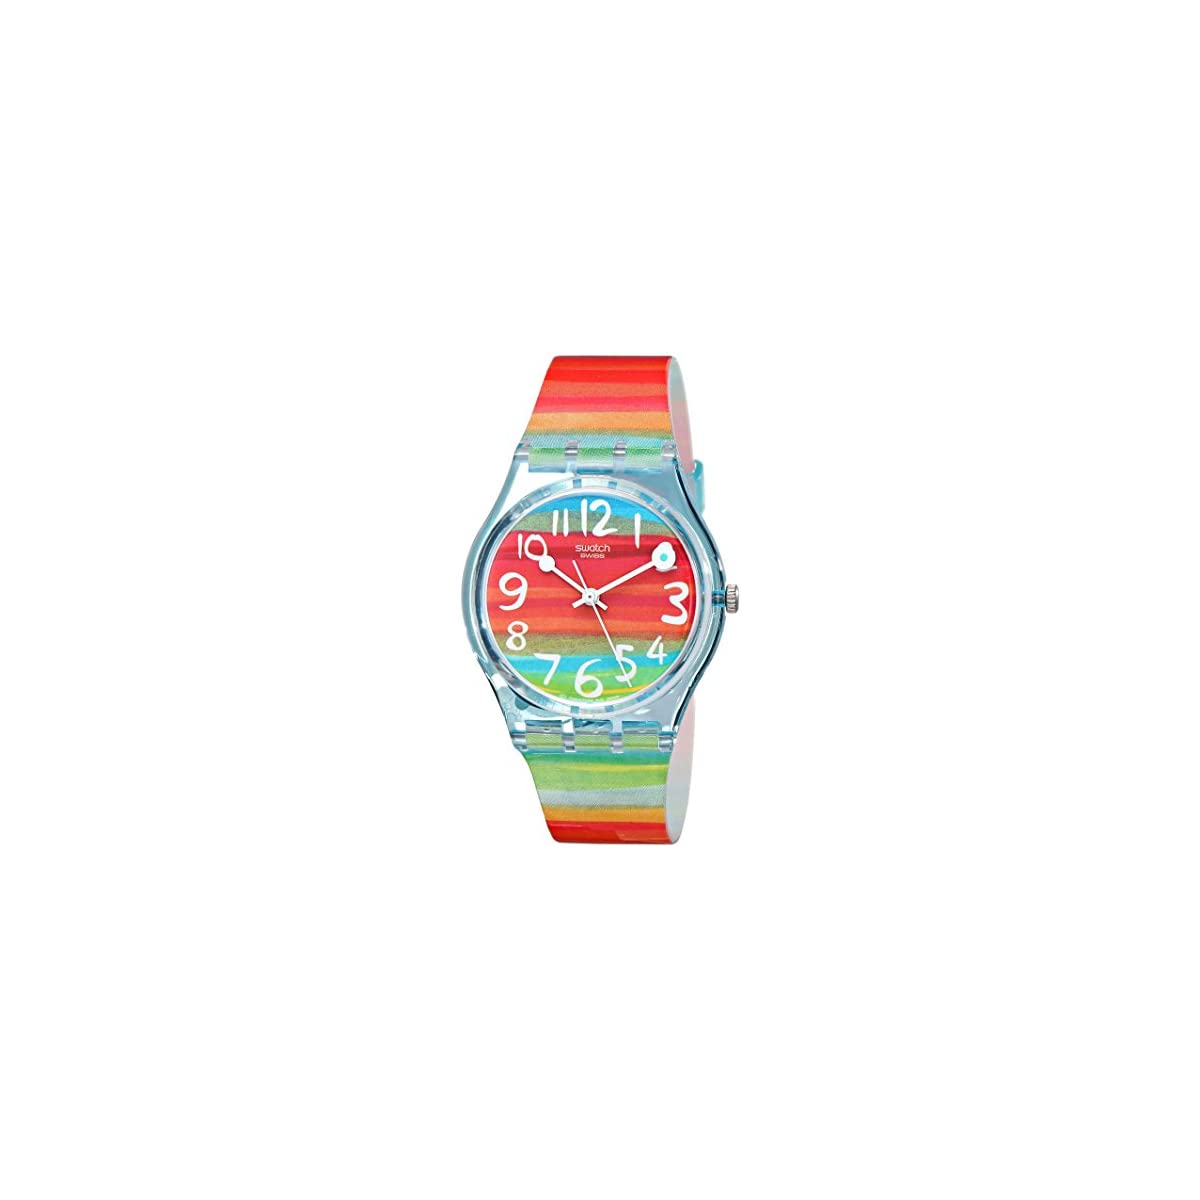 51Z%2BFdvtZiL. SS1200  - Swatch Reloj Analógico de Cuarzo para Mujer con Correa de Plástico - GS 124